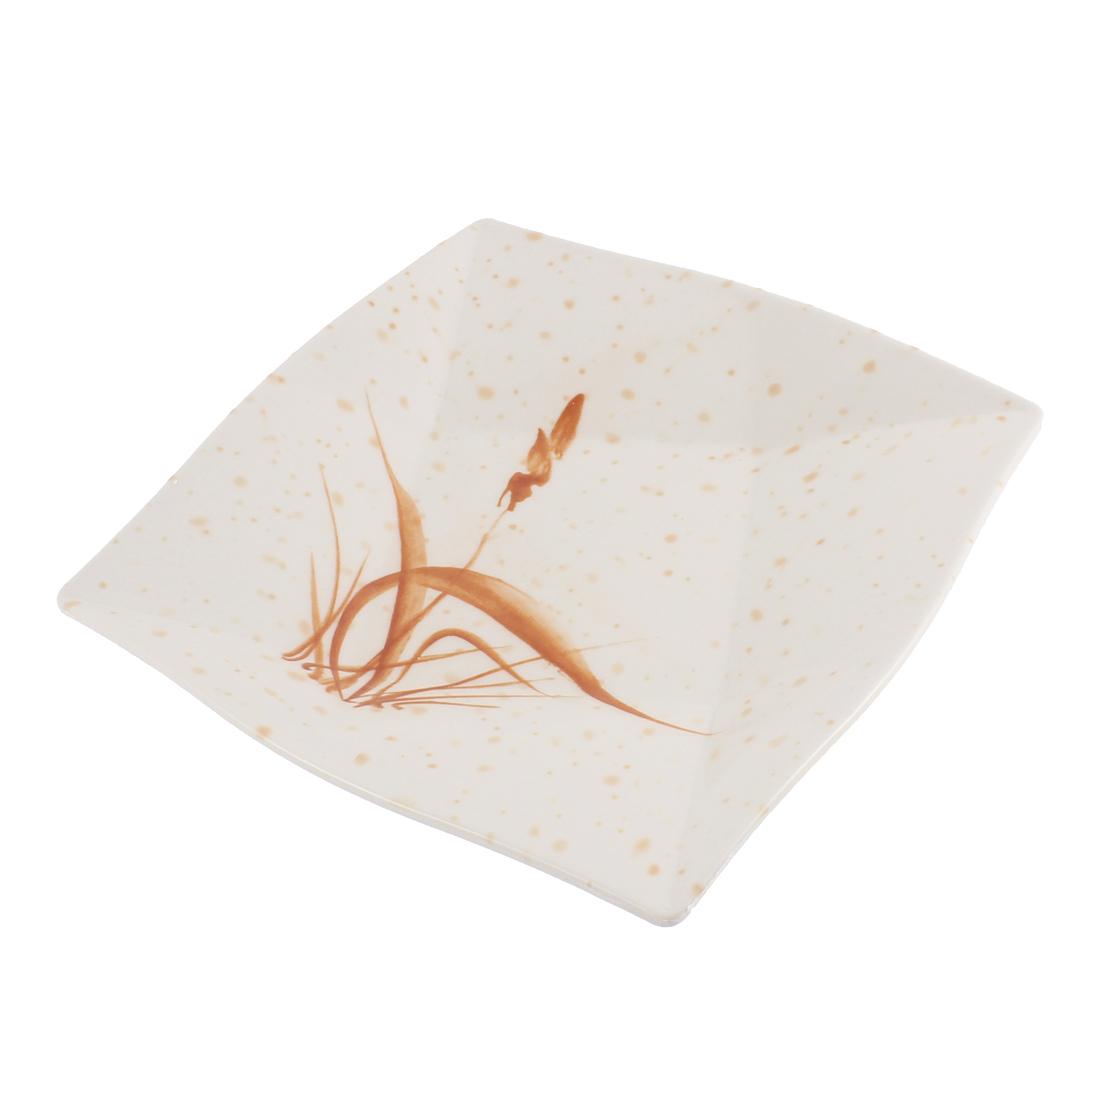 "Restaurant Plastic Grass Pattern Square Shape Dish 9"" x 9"""